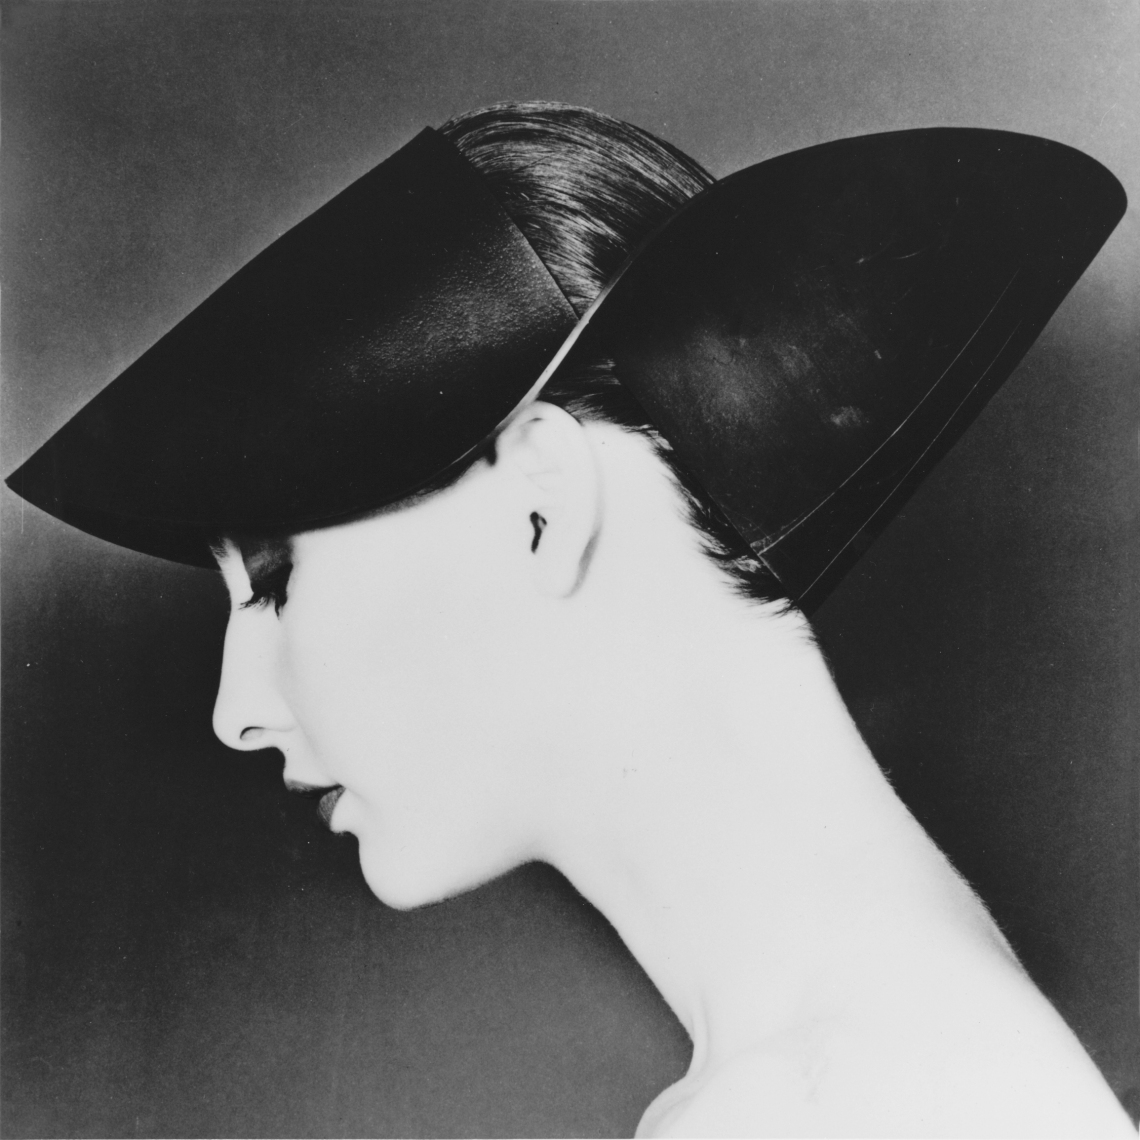 Maria Blaisse, Flexicap 2, 1985-1989. Foto met dank aan Maria Blaisse©